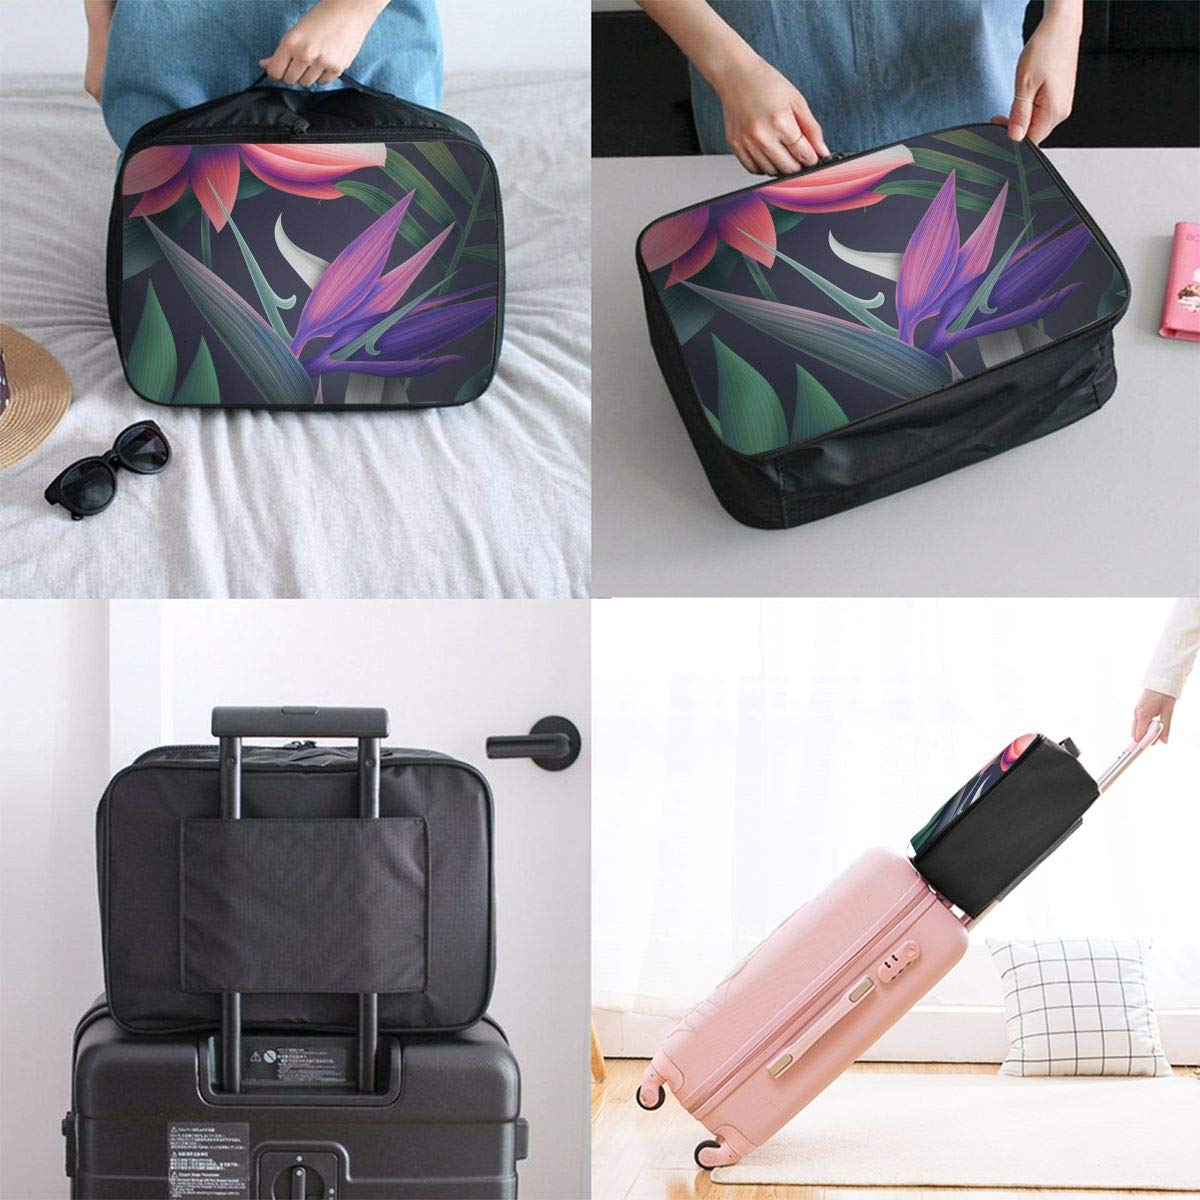 Travel Luggage Duffle Bag Lightweight Portable Handbag Floral Print Large Capacity Waterproof Foldable Storage Tote